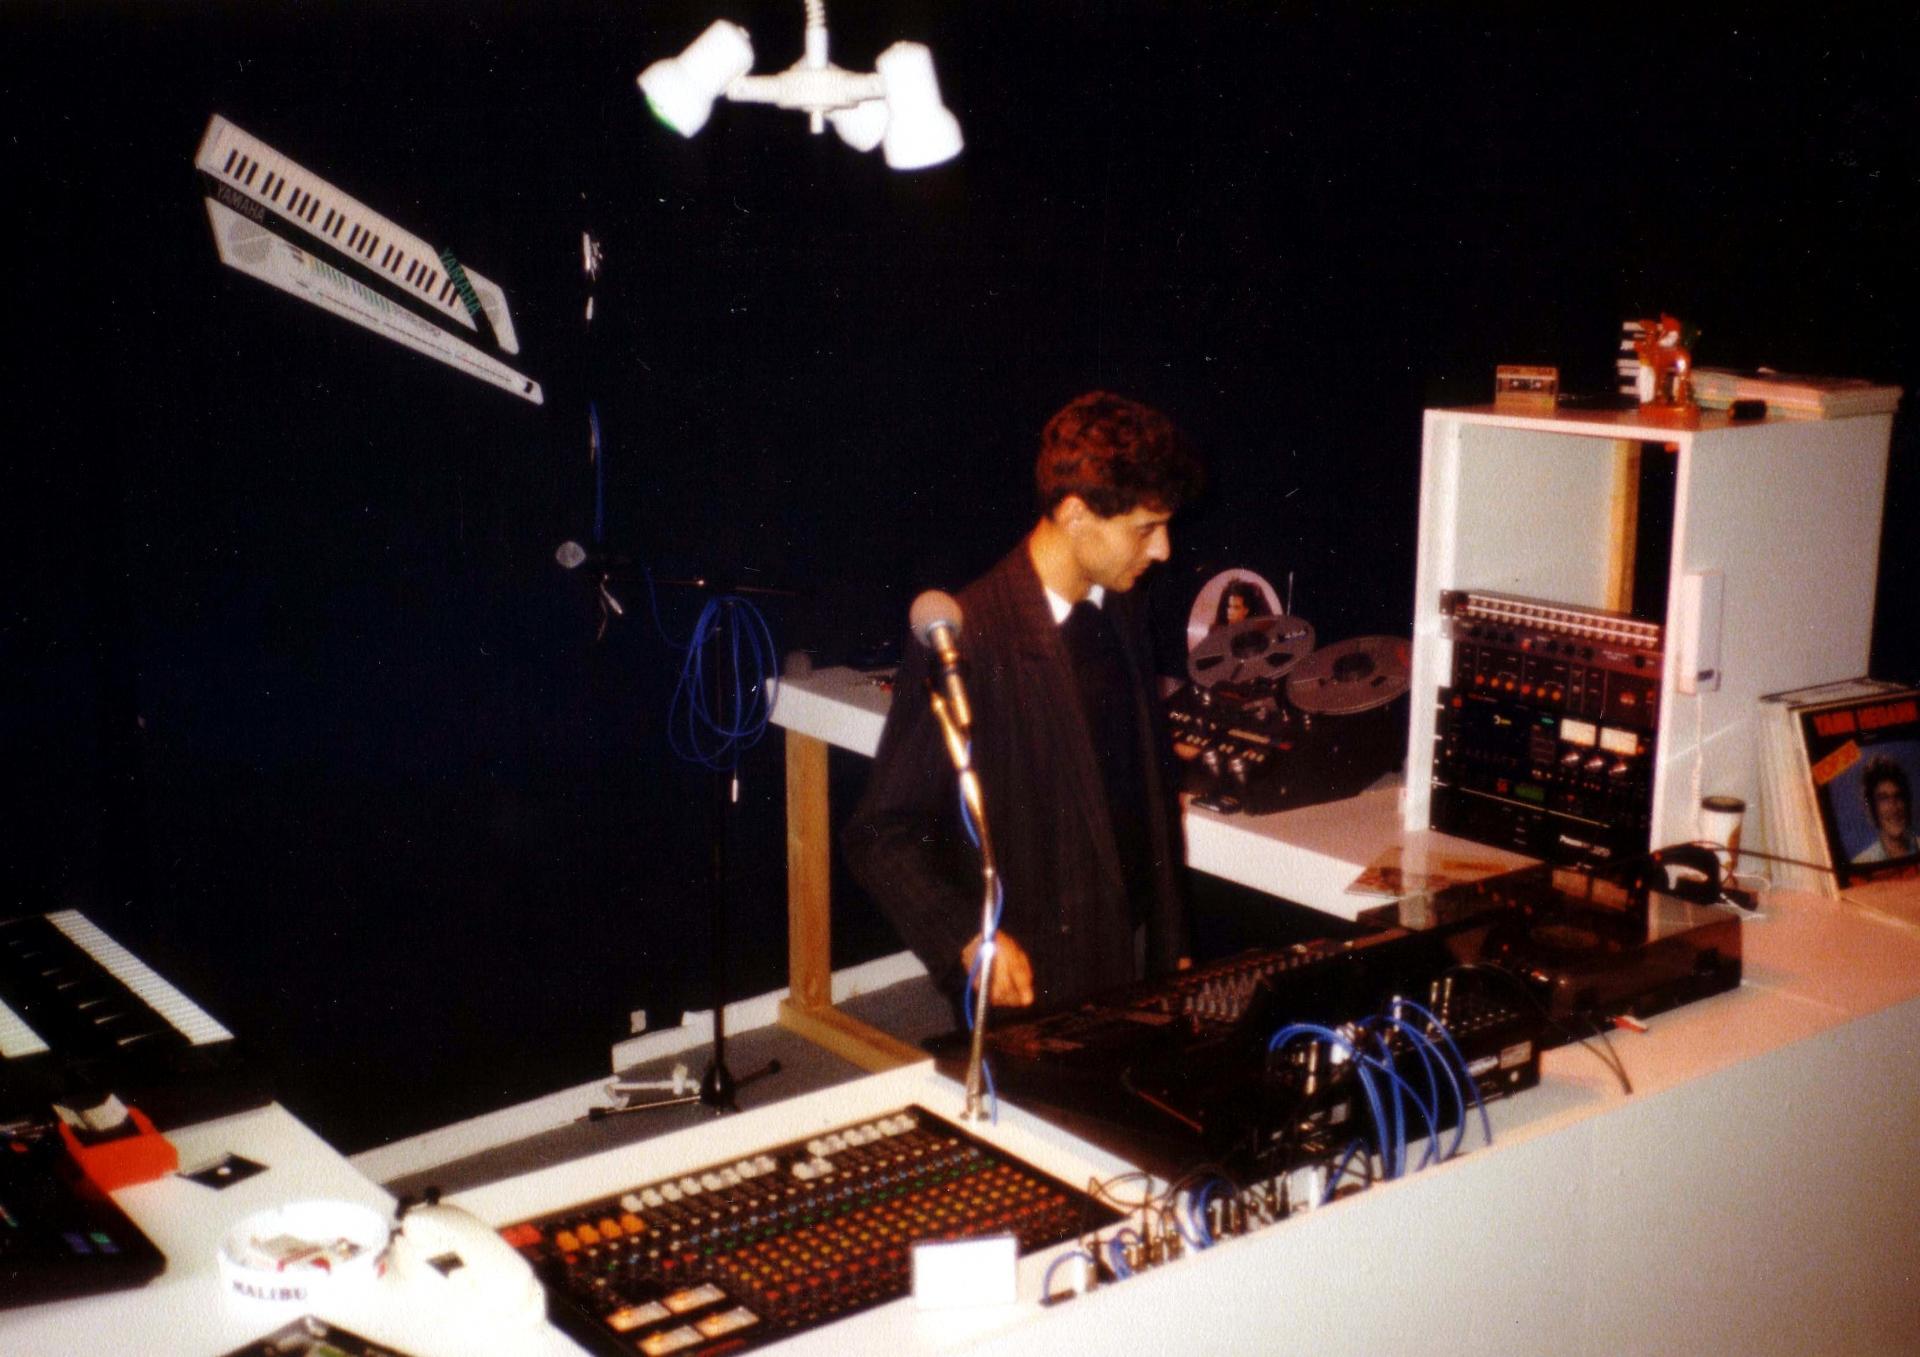 Studio dj center chaumont 52000